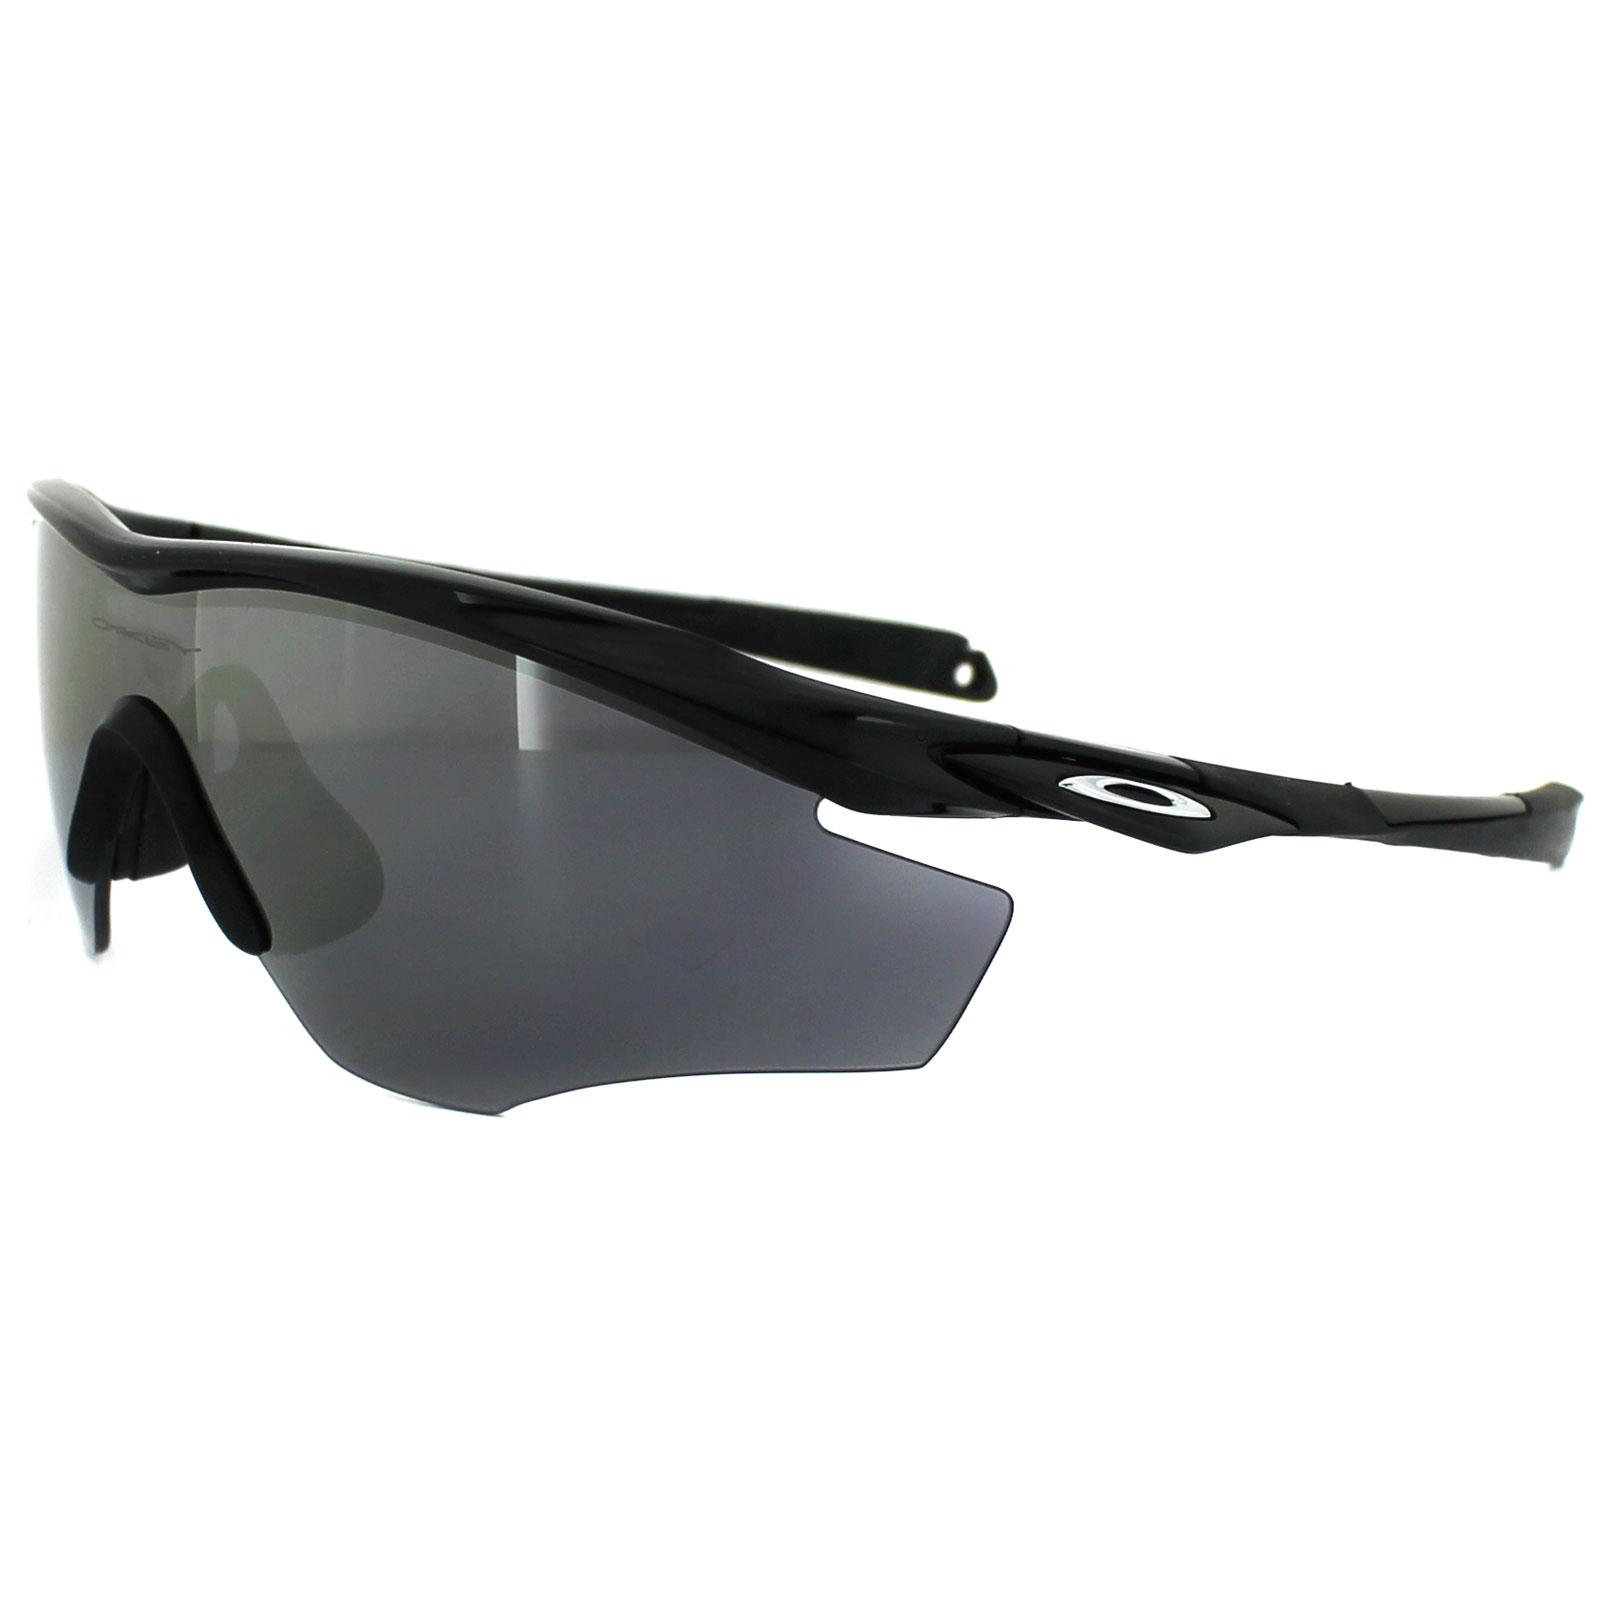 d31e2de6e1a Cheap Oakley M2 Frame Sunglasses - Discounted Sunglasses